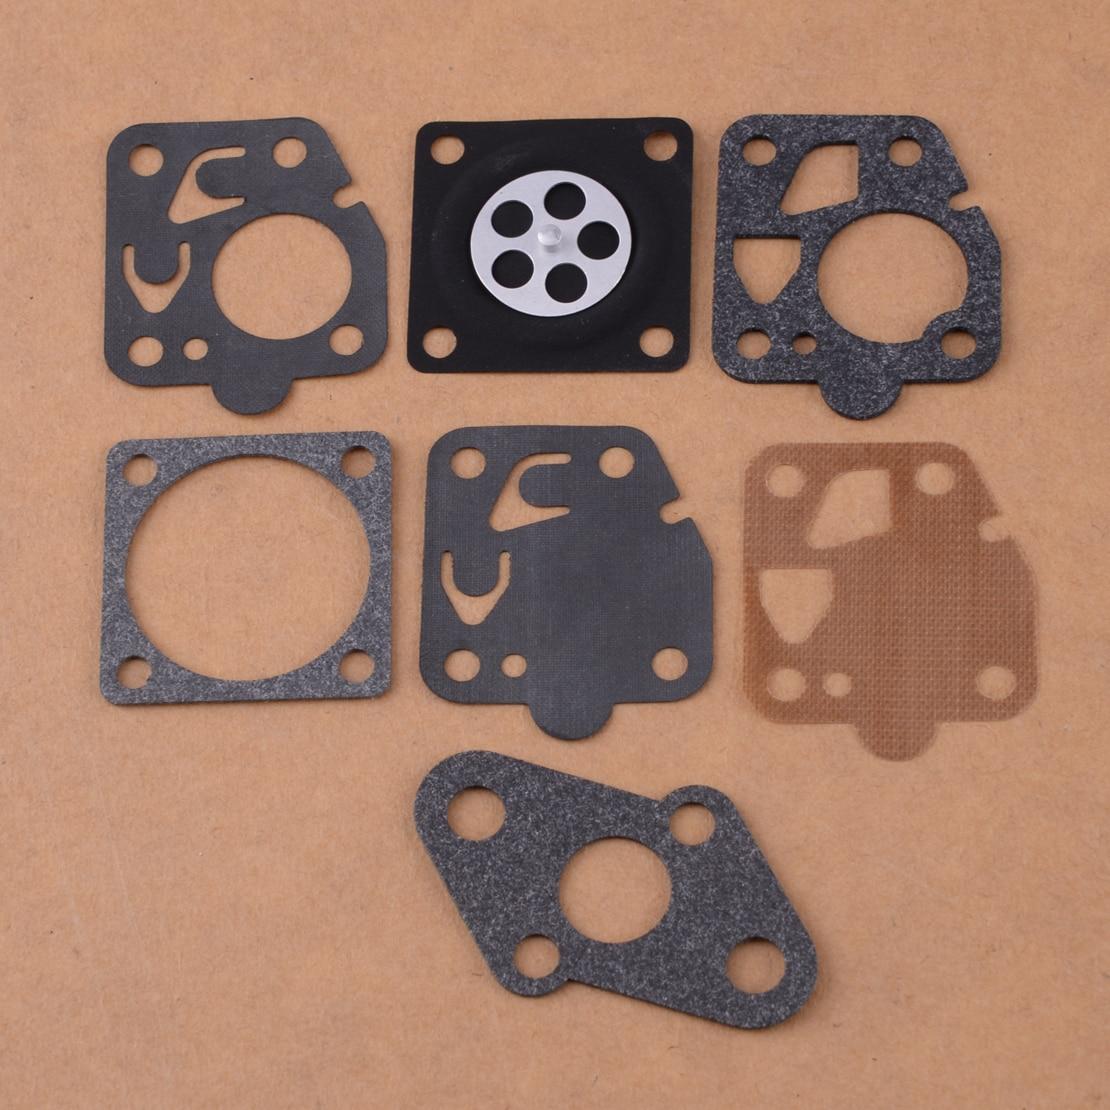 LETAOSK Carburetor Diaphgram Gasket Kit Replacement A98064-11 99909-105 Fit For Shindaiwa T20 C35 Engine Trimmer